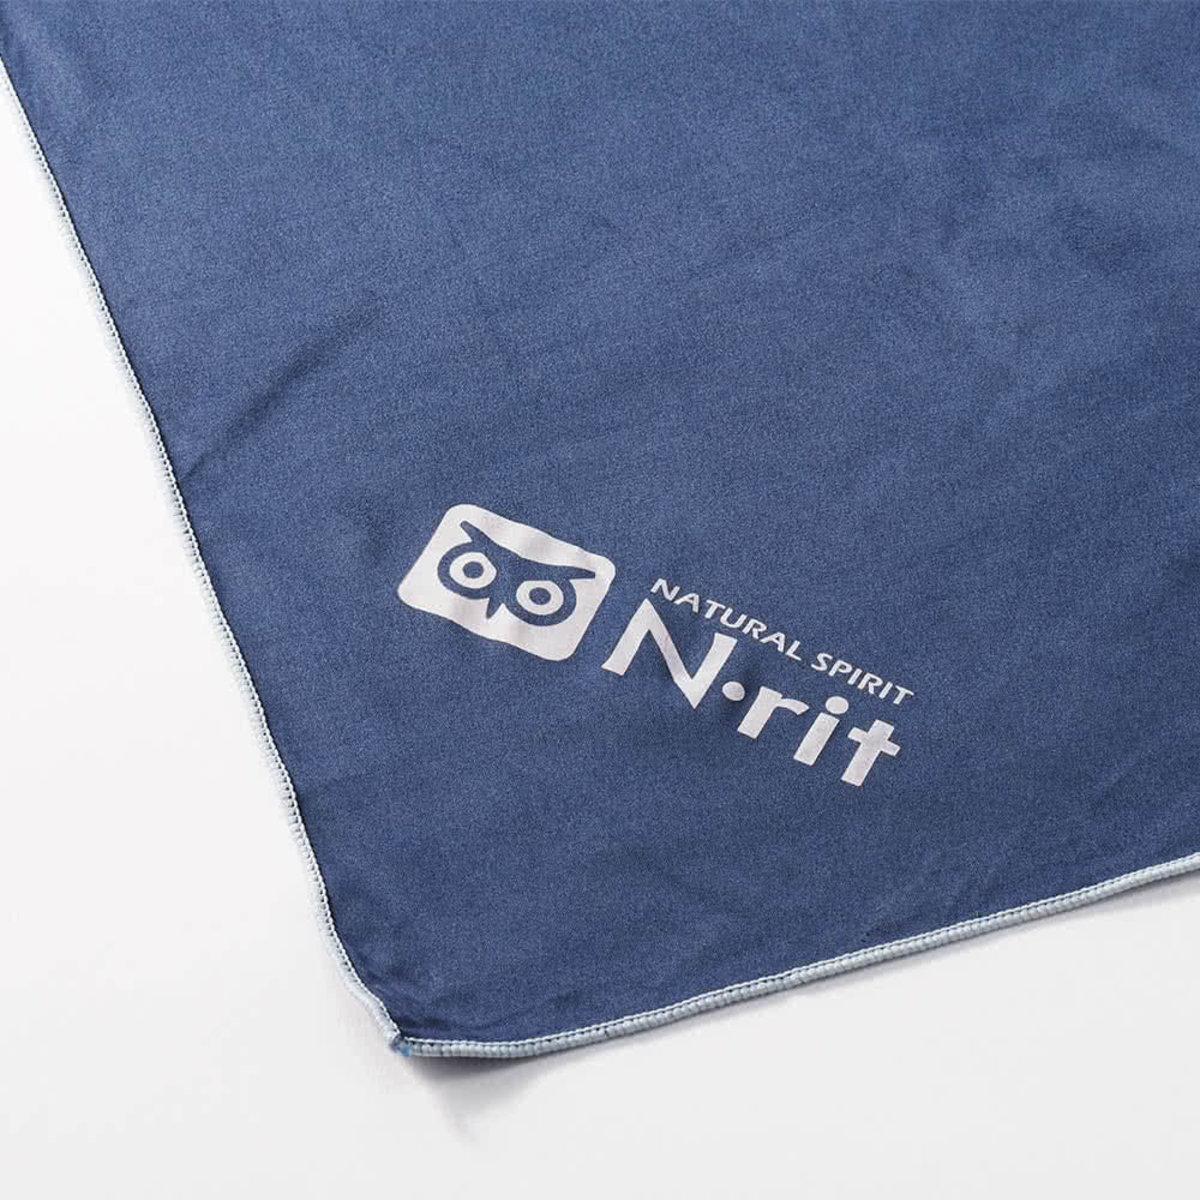 Super Light Towel M navy